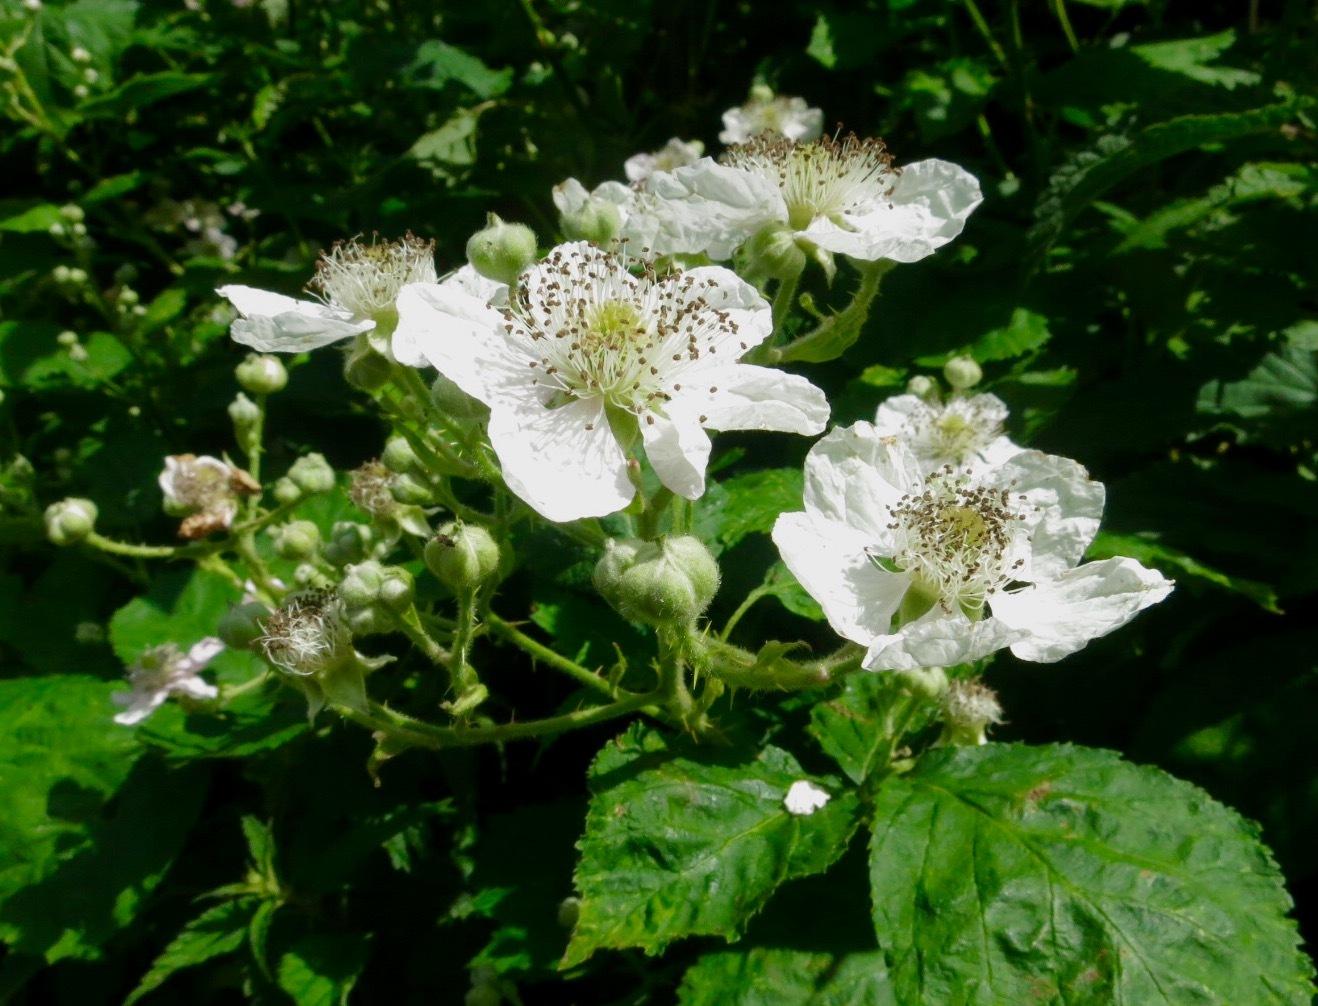 Brambles in flower